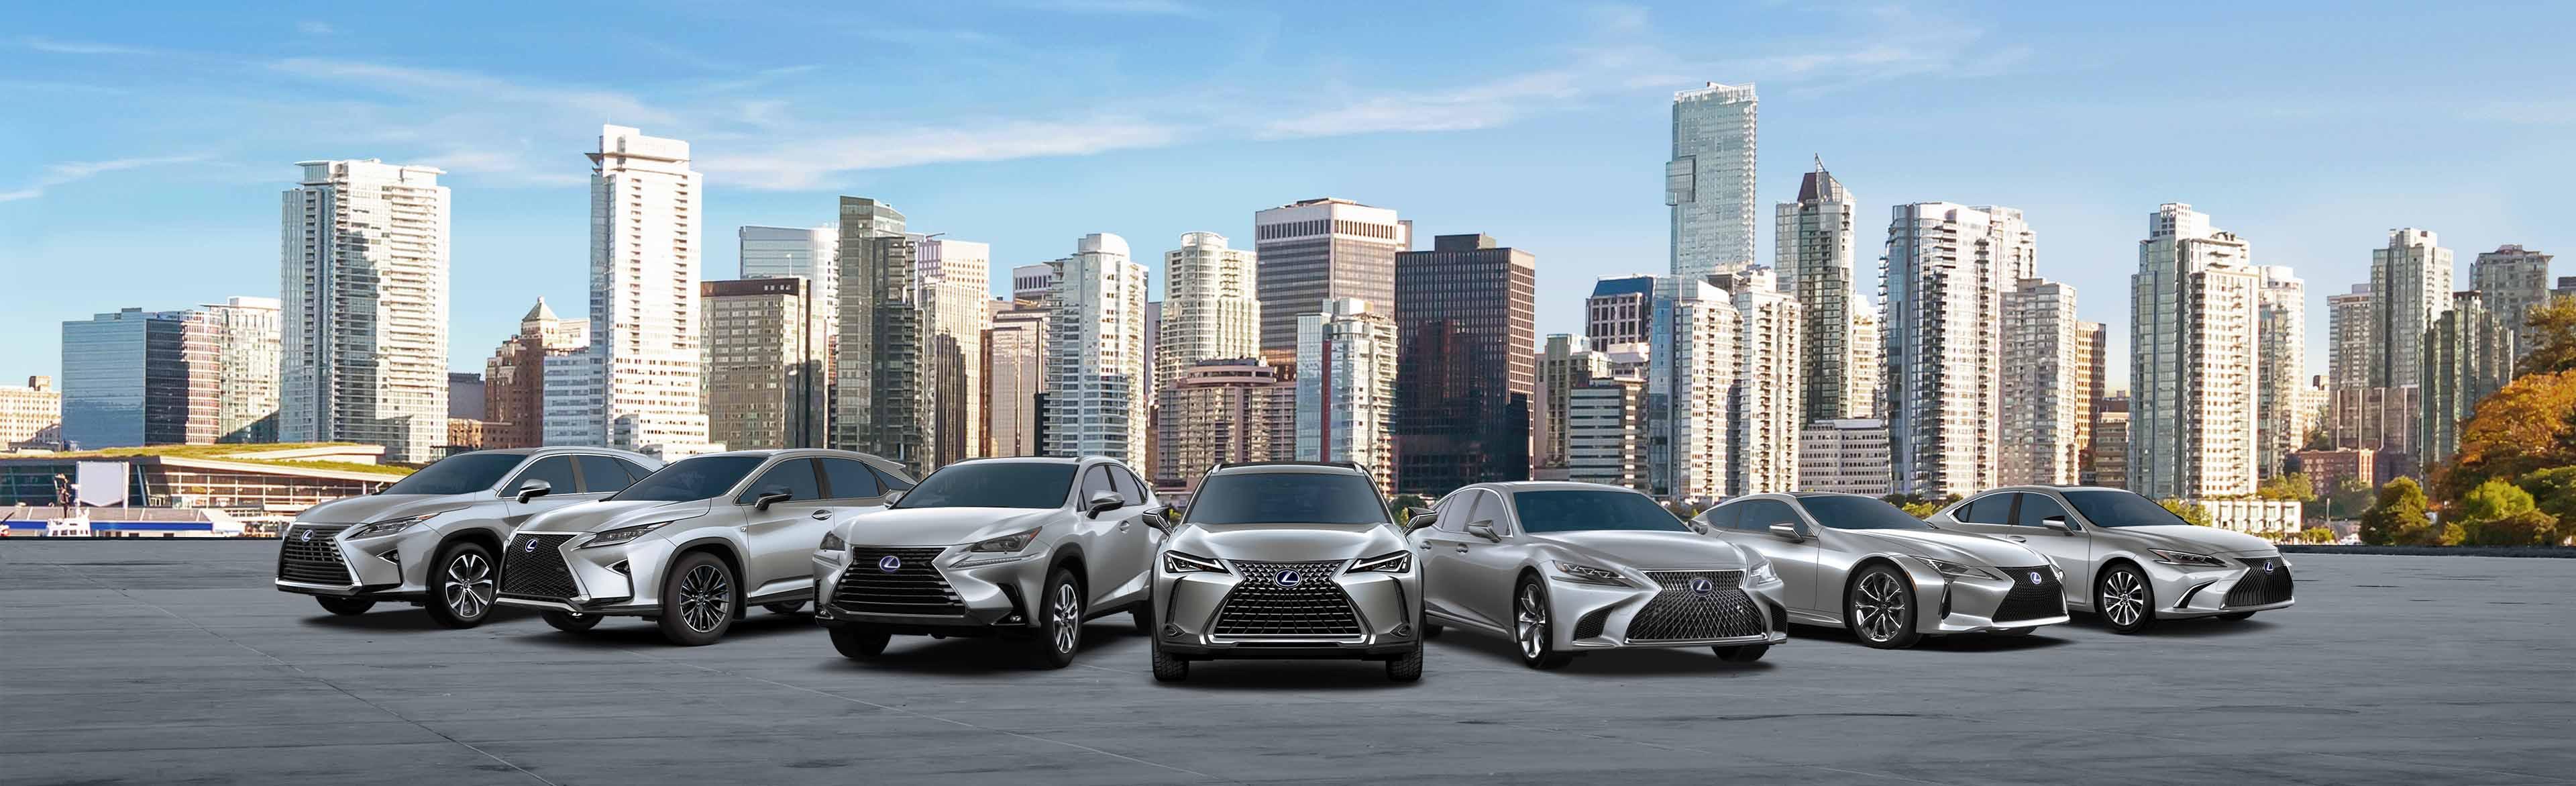 Lexus Lineup